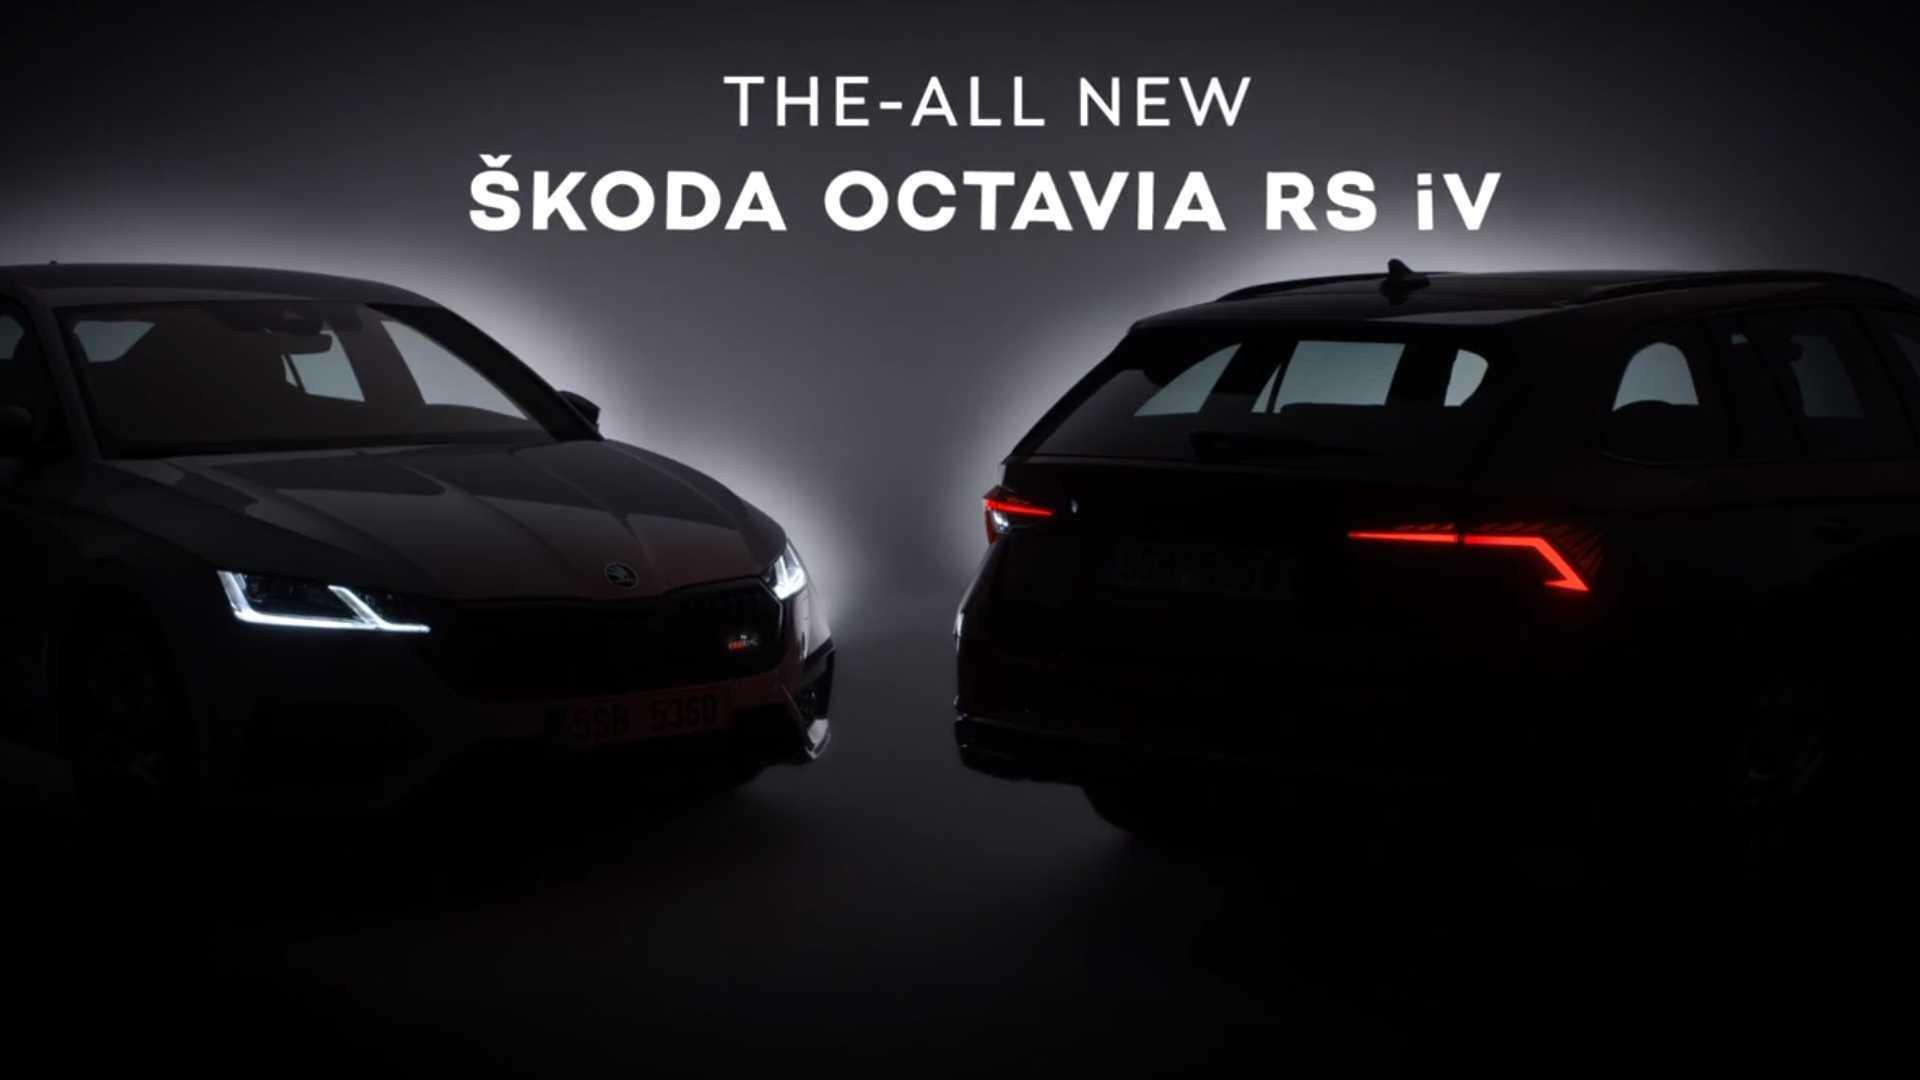 2021 Skoda Octavia Rs Iv Final Teaser Video Is Electrifying